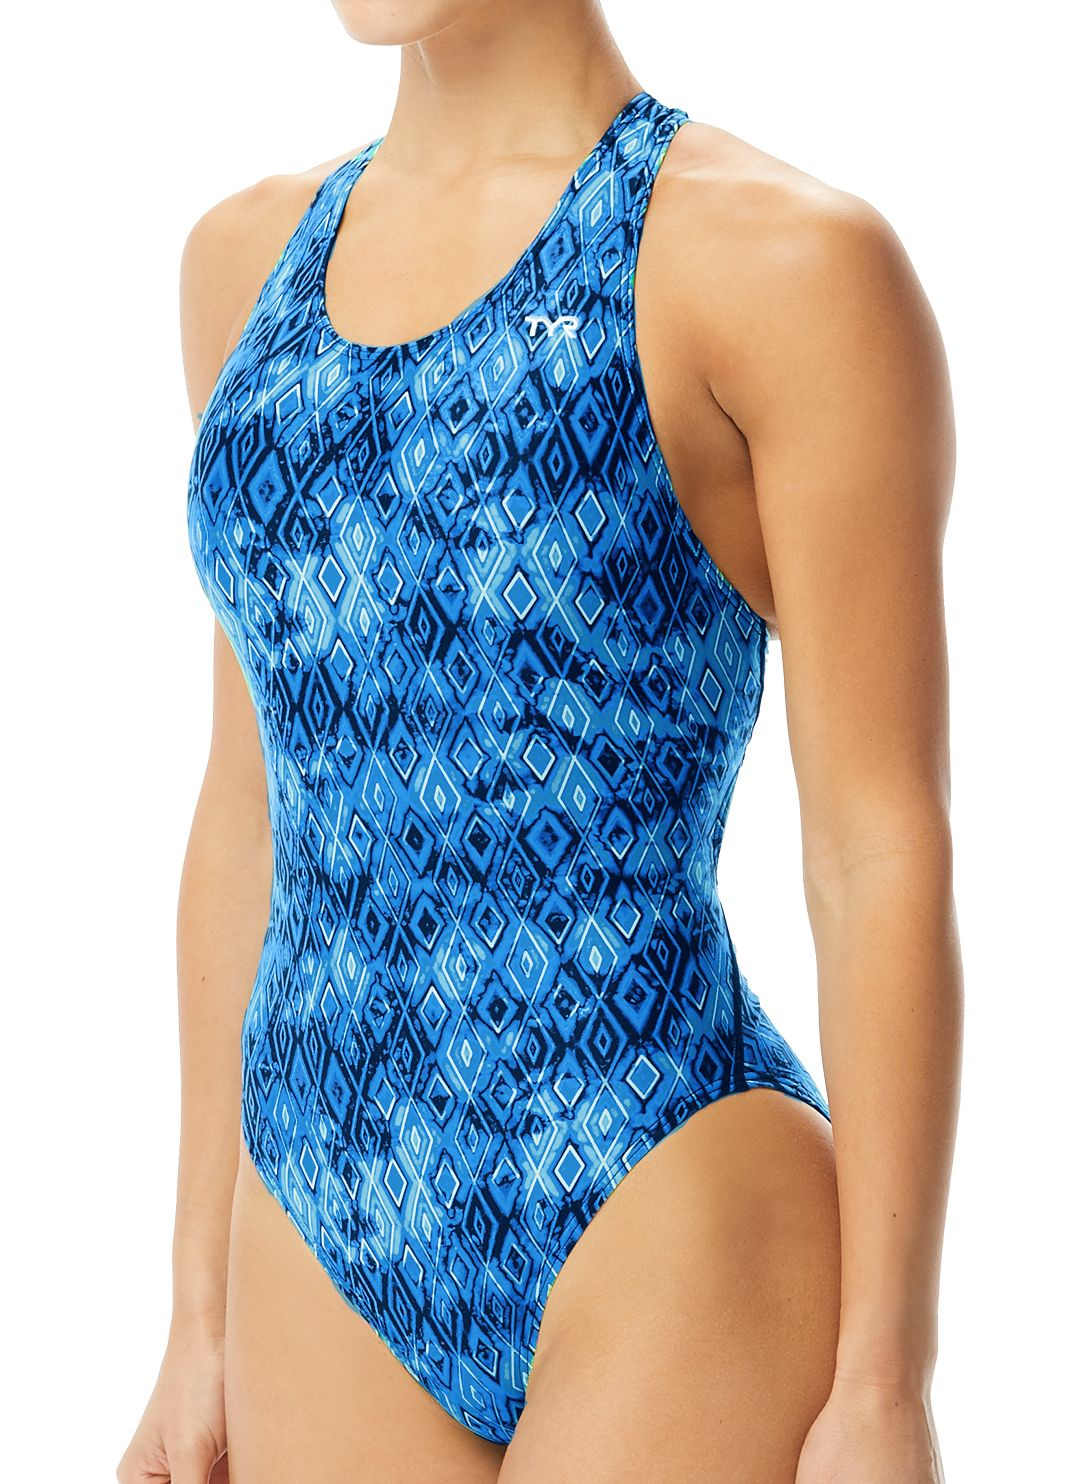 4d90935a4d8 TYR Women's Glacial Maxfit One Piece Swimsuit. noImageFound. Previous. 1